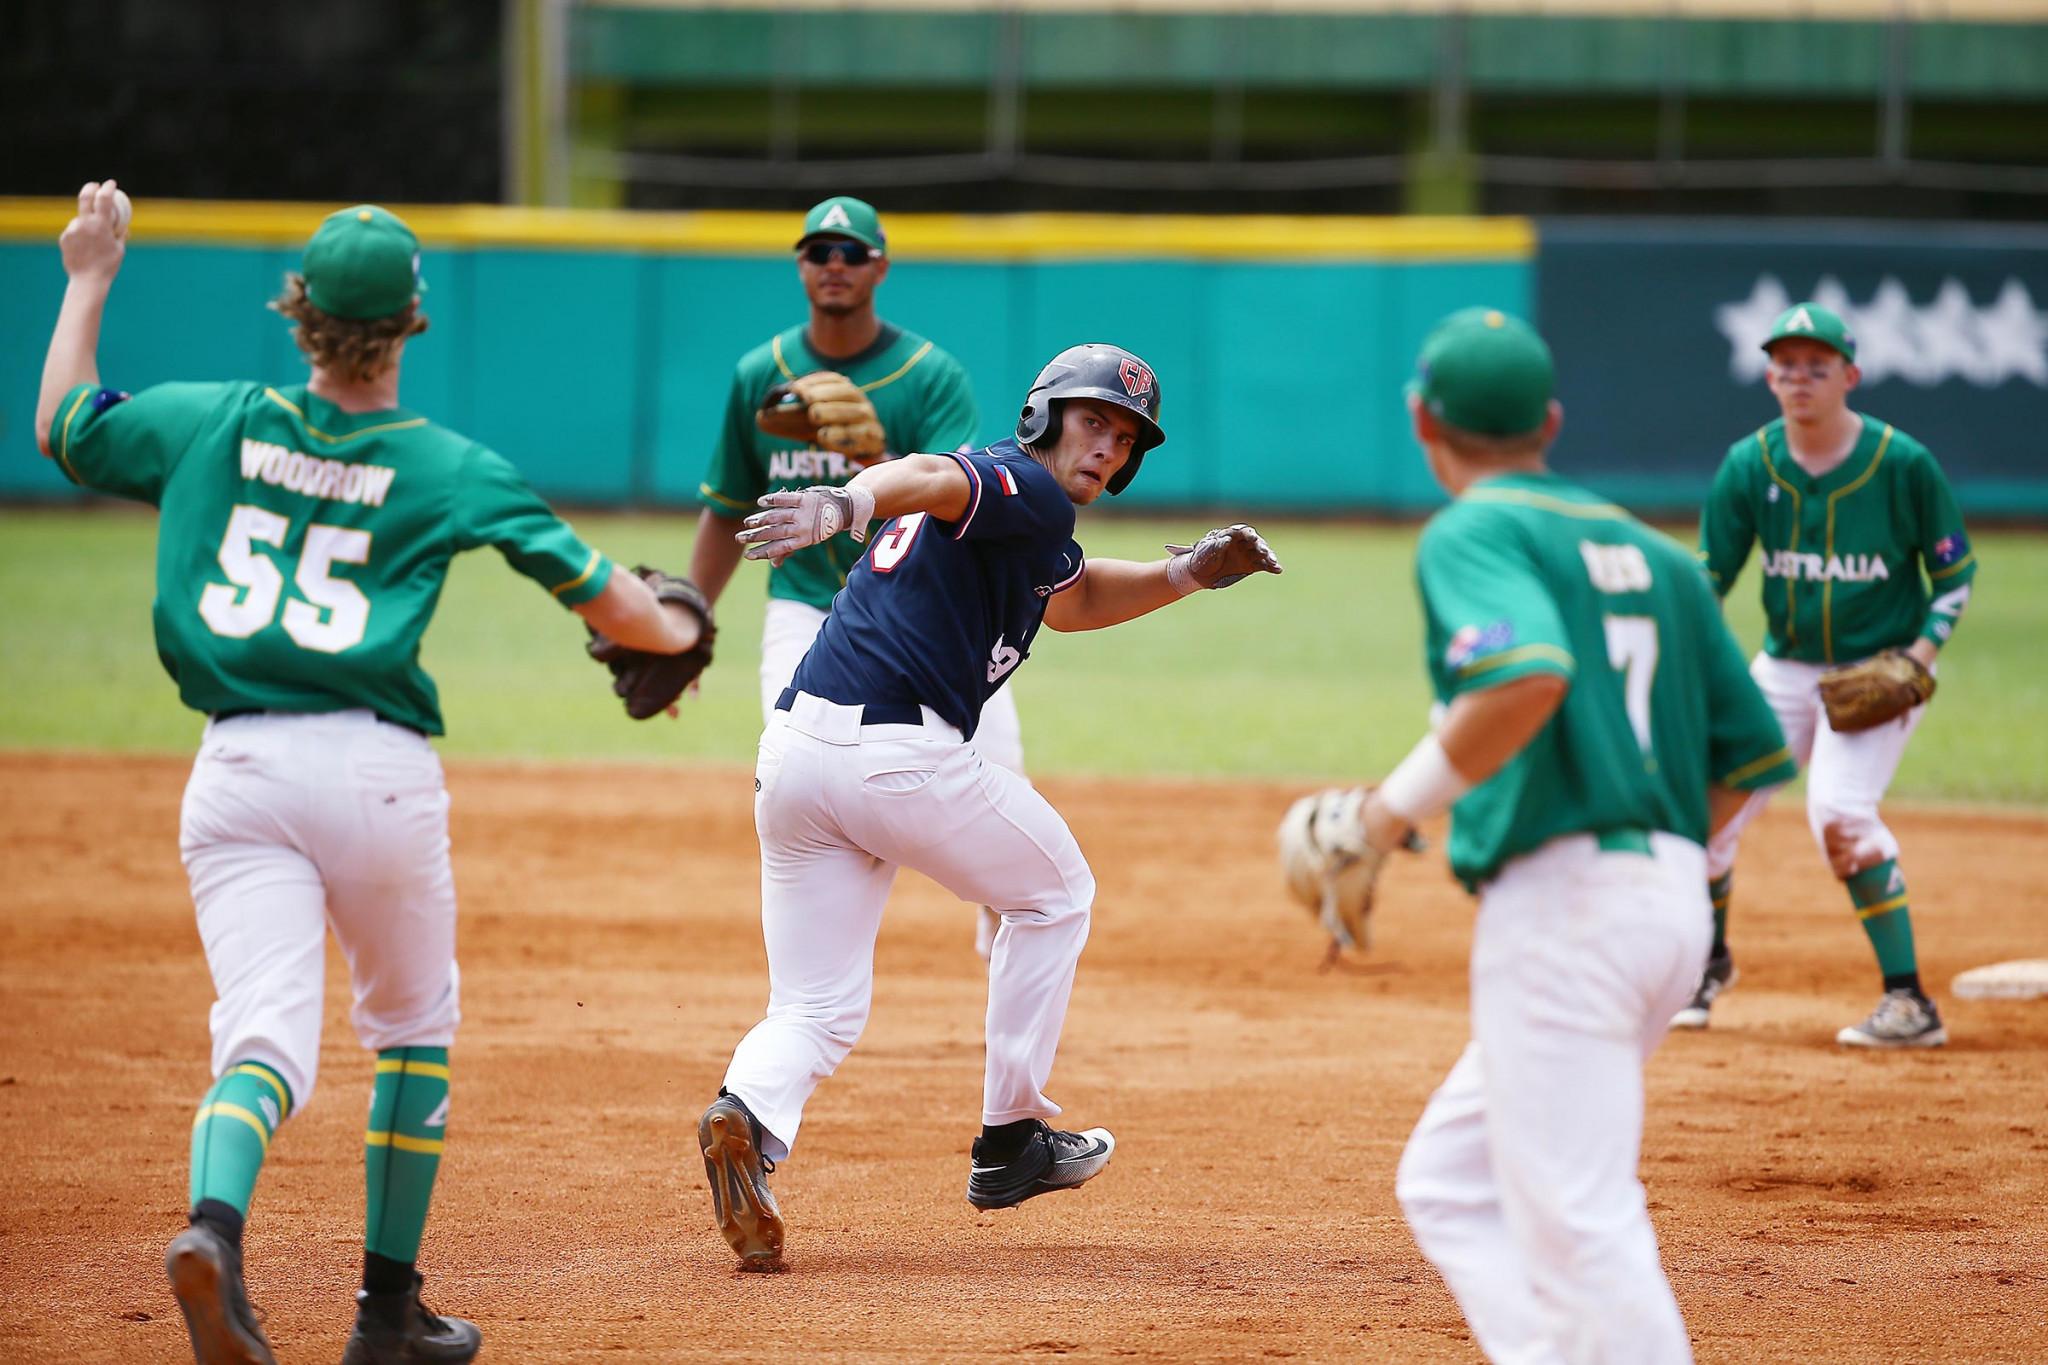 Chinese Taipei head to super round in style at World University Baseball Championship